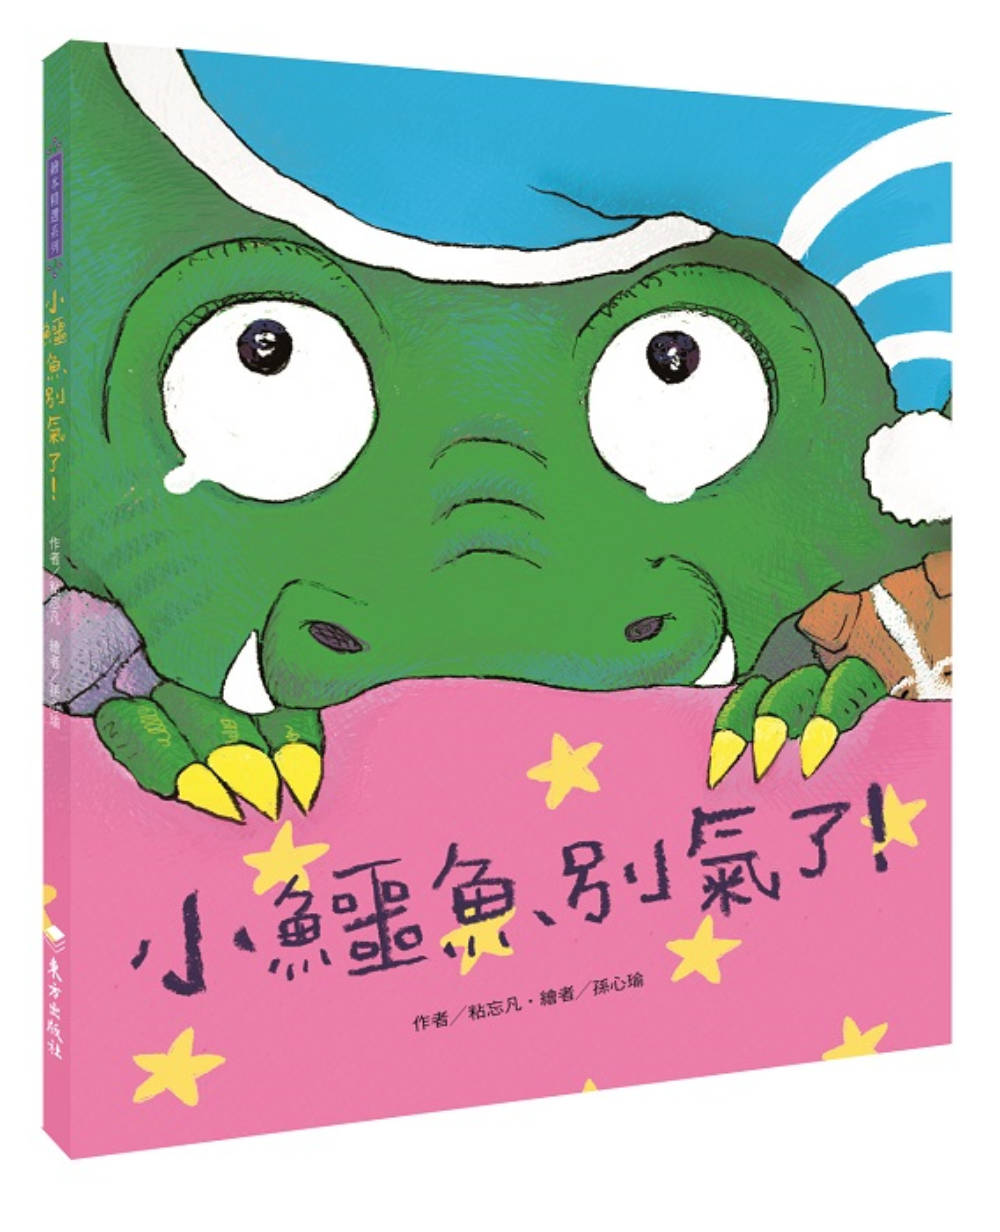 http://im2.book.com.tw/image/getImage?i=http://www.books.com.tw/img/001/075/70/0010757030_bc_01.jpg&v=594baaea&w=655&h=609